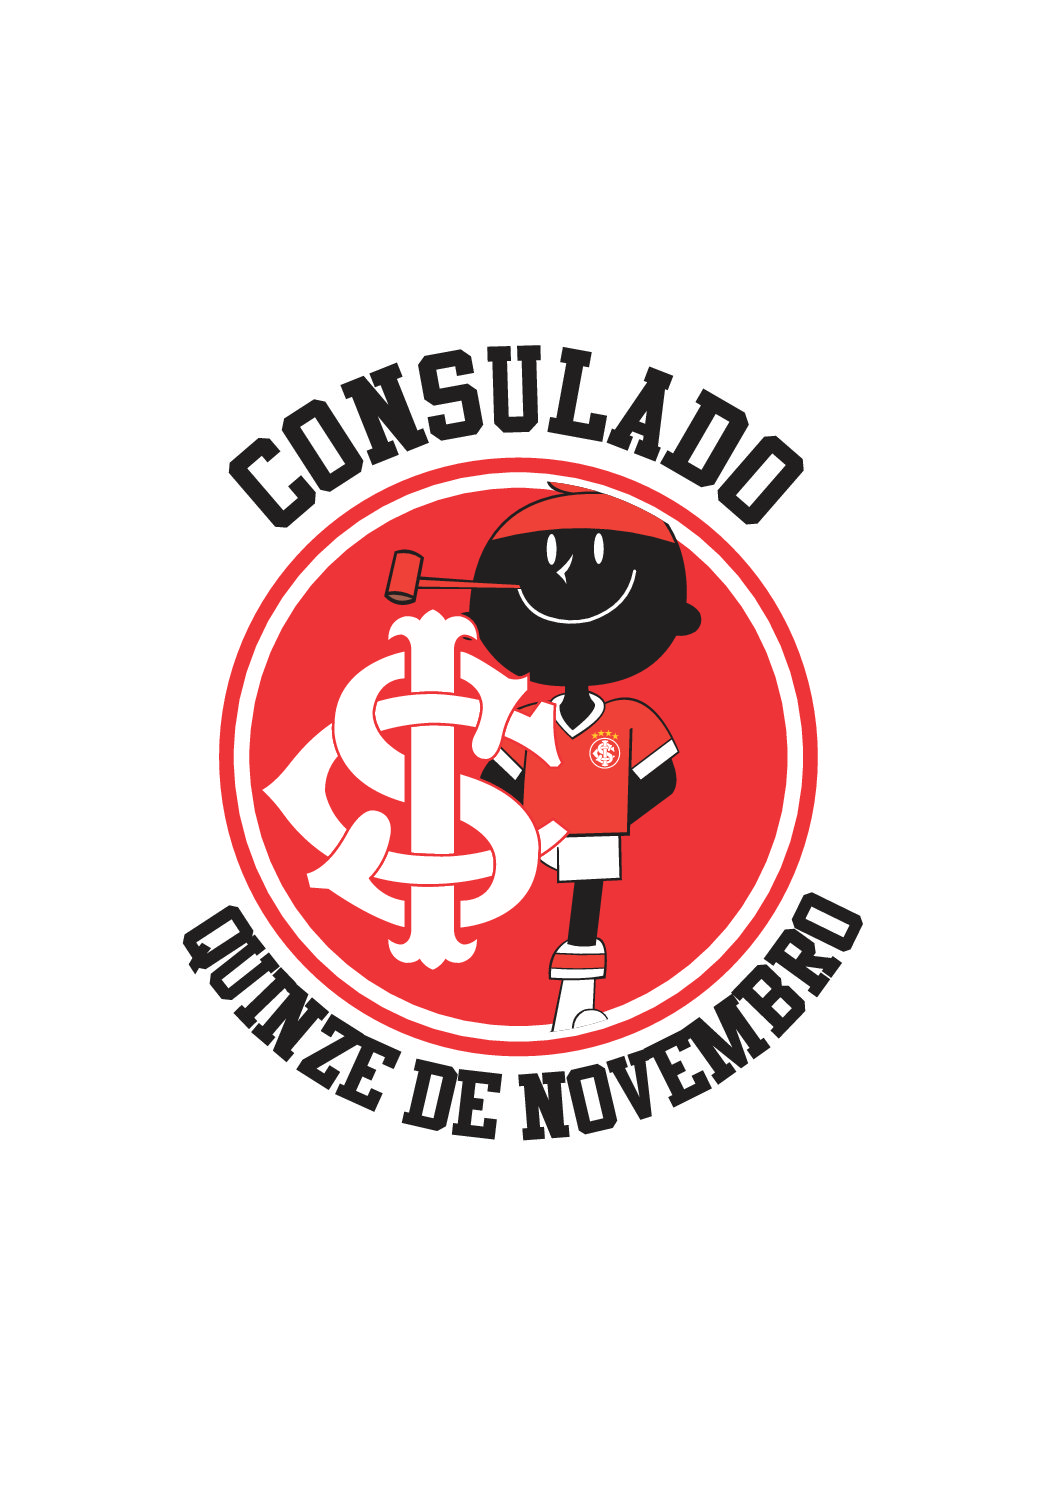 CAMISETAS PARA TORCIDA DO INTERNACIONAL DO CONSULADO DE QUINZE DE NOVEMBRO/RS.